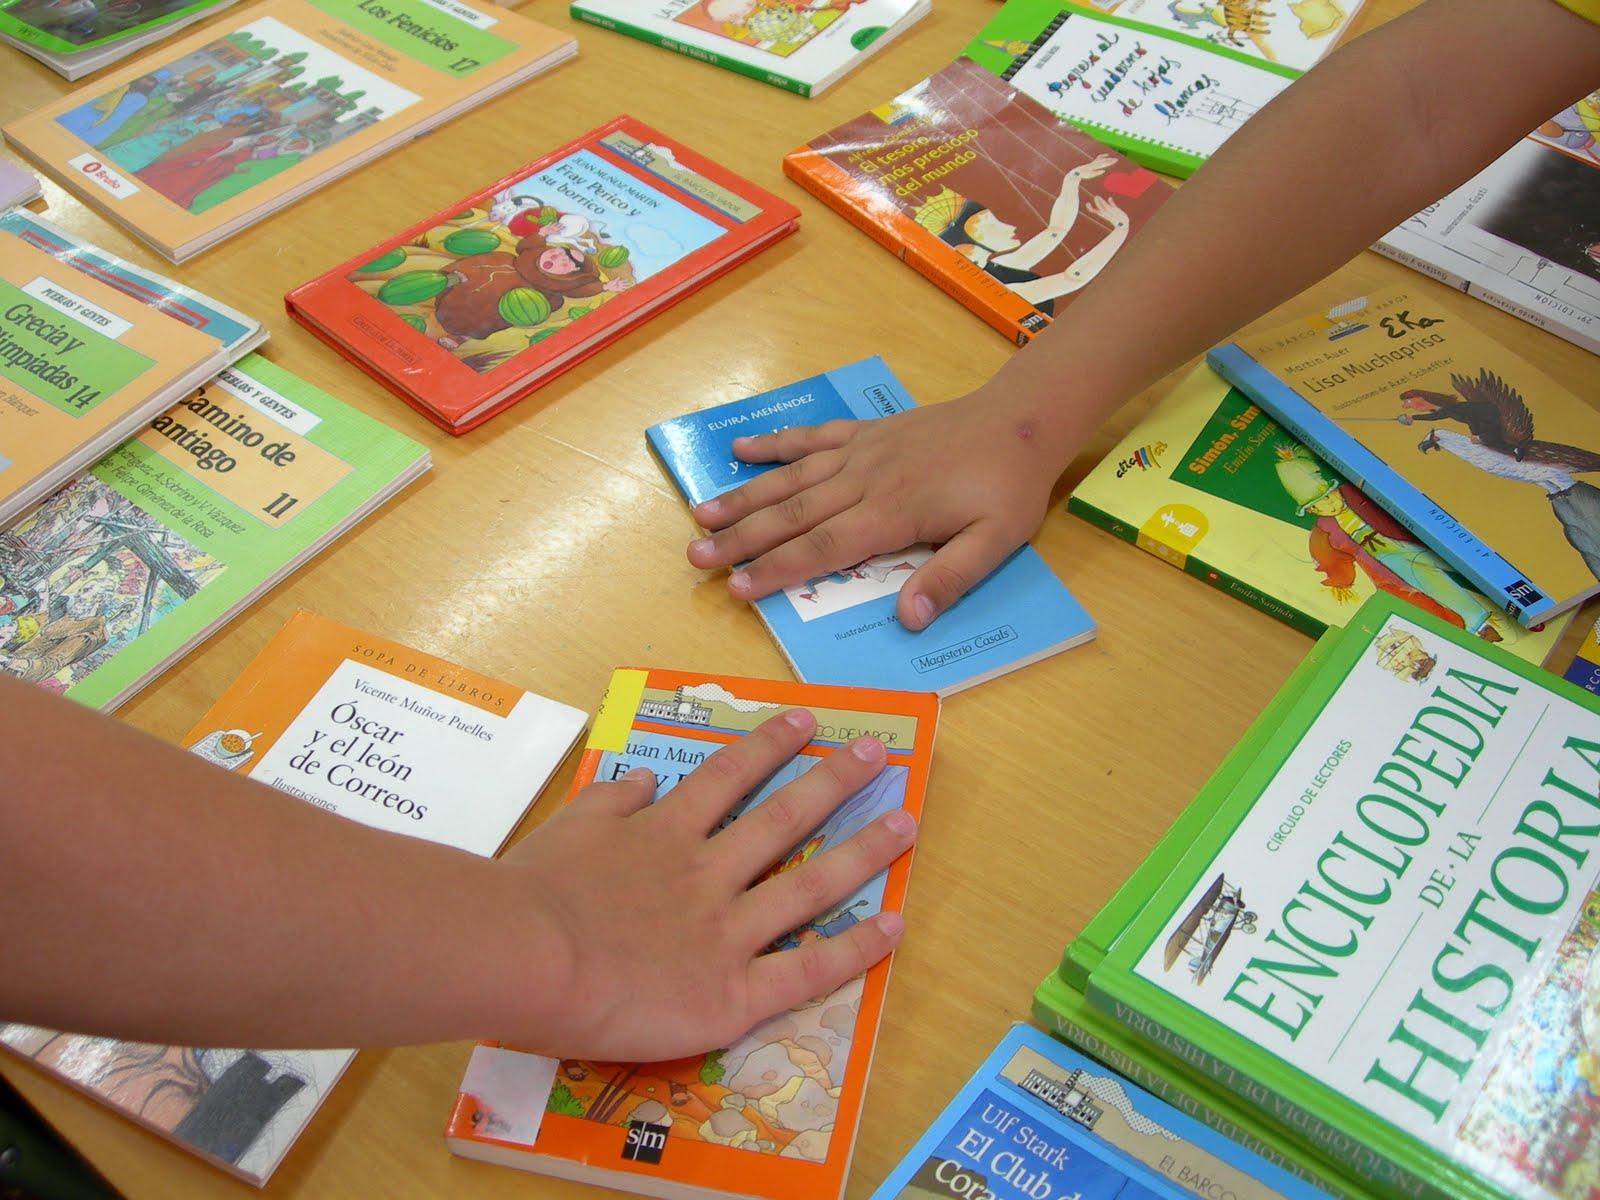 libros infantiles leer todomundopeques lectura verano